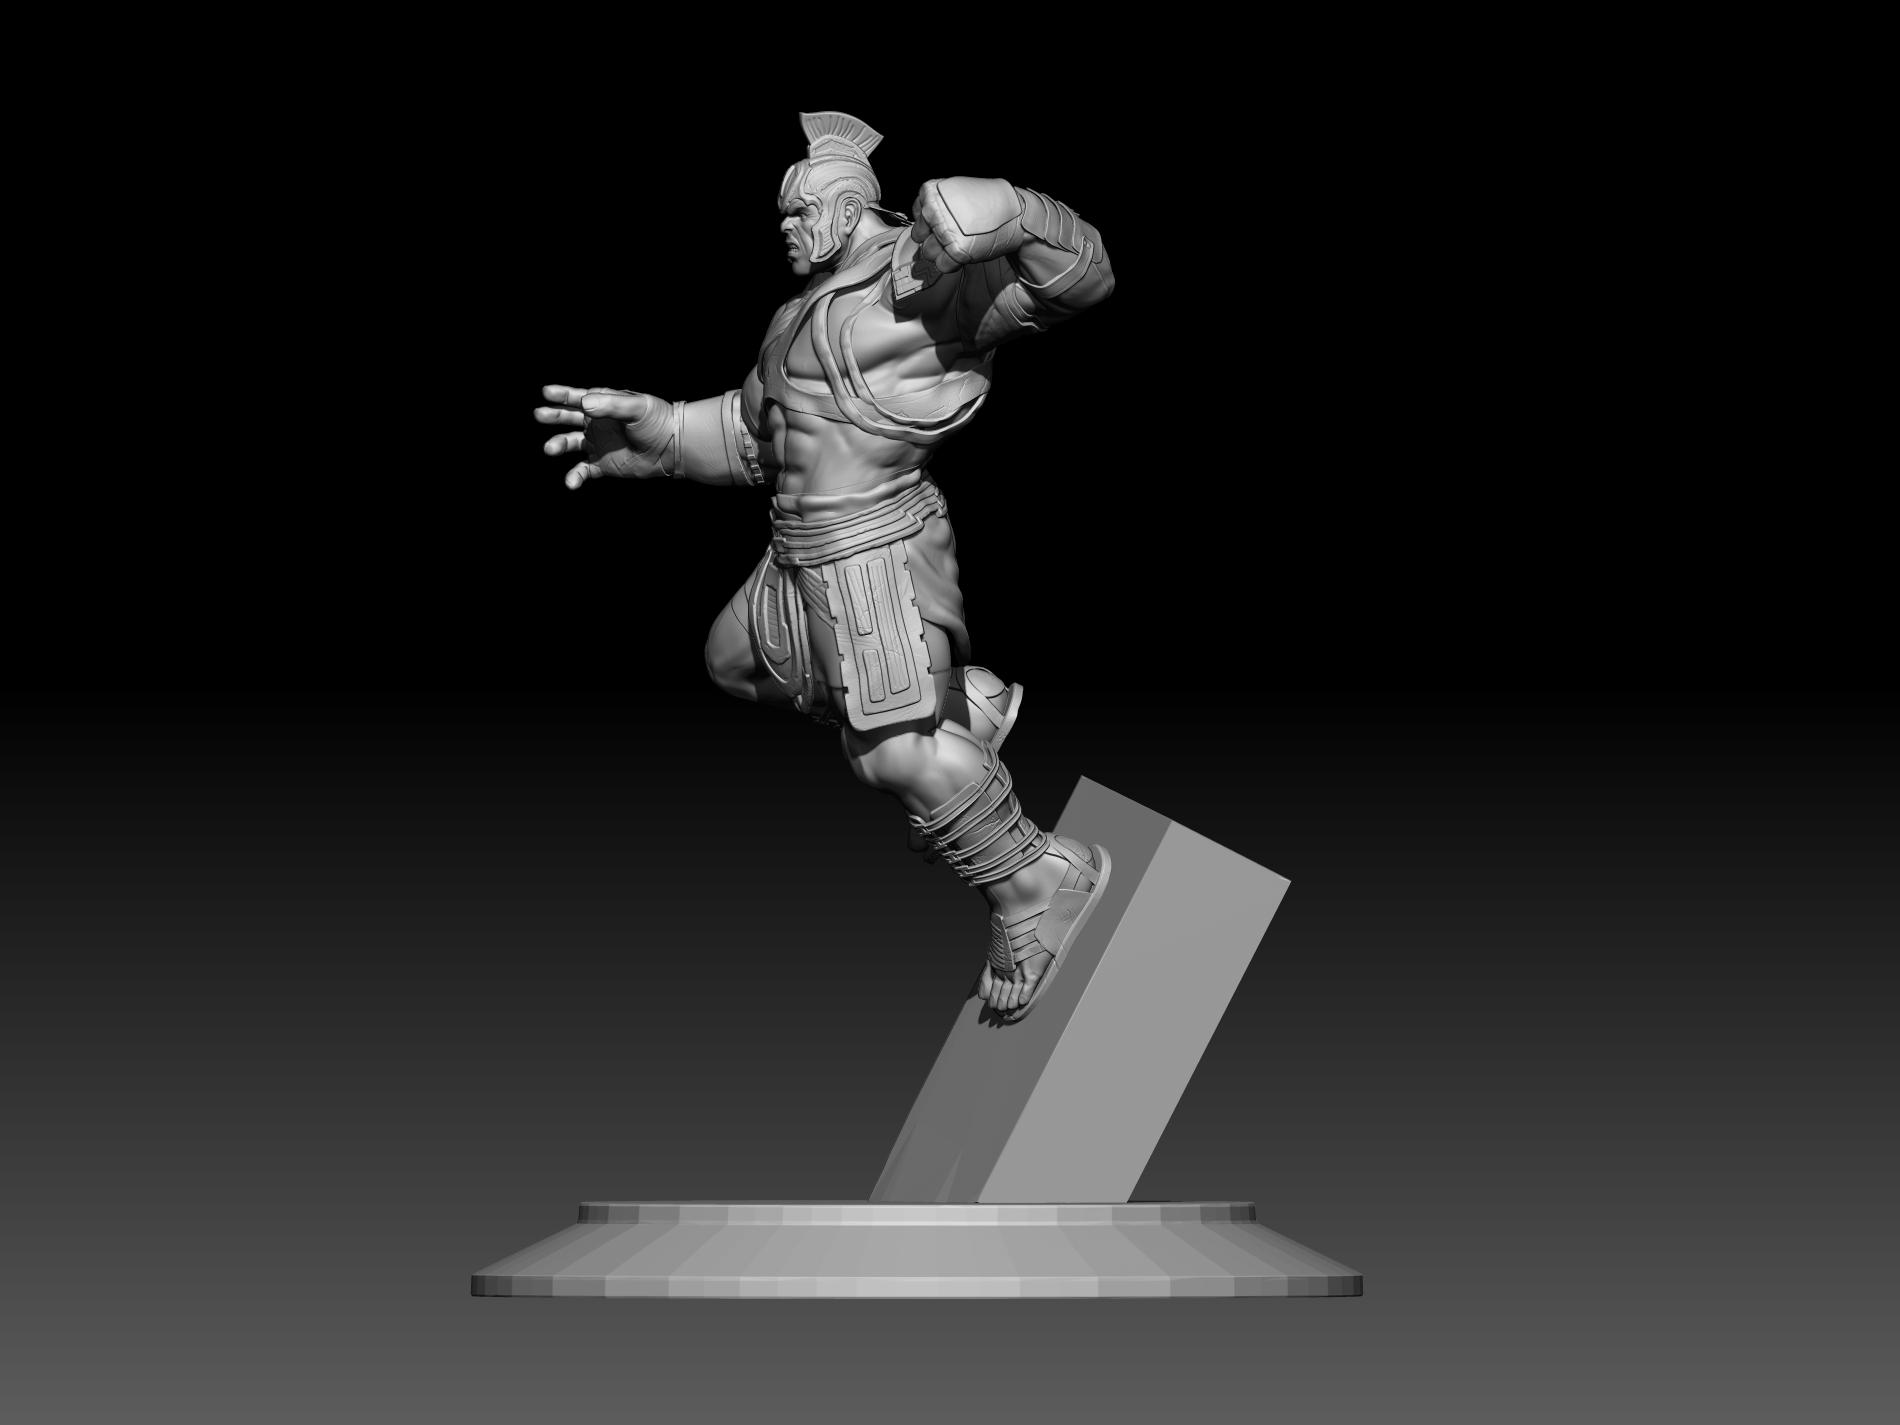 10.jpg Download STL file Hulk 3D print • Model to 3D print, mark_nato